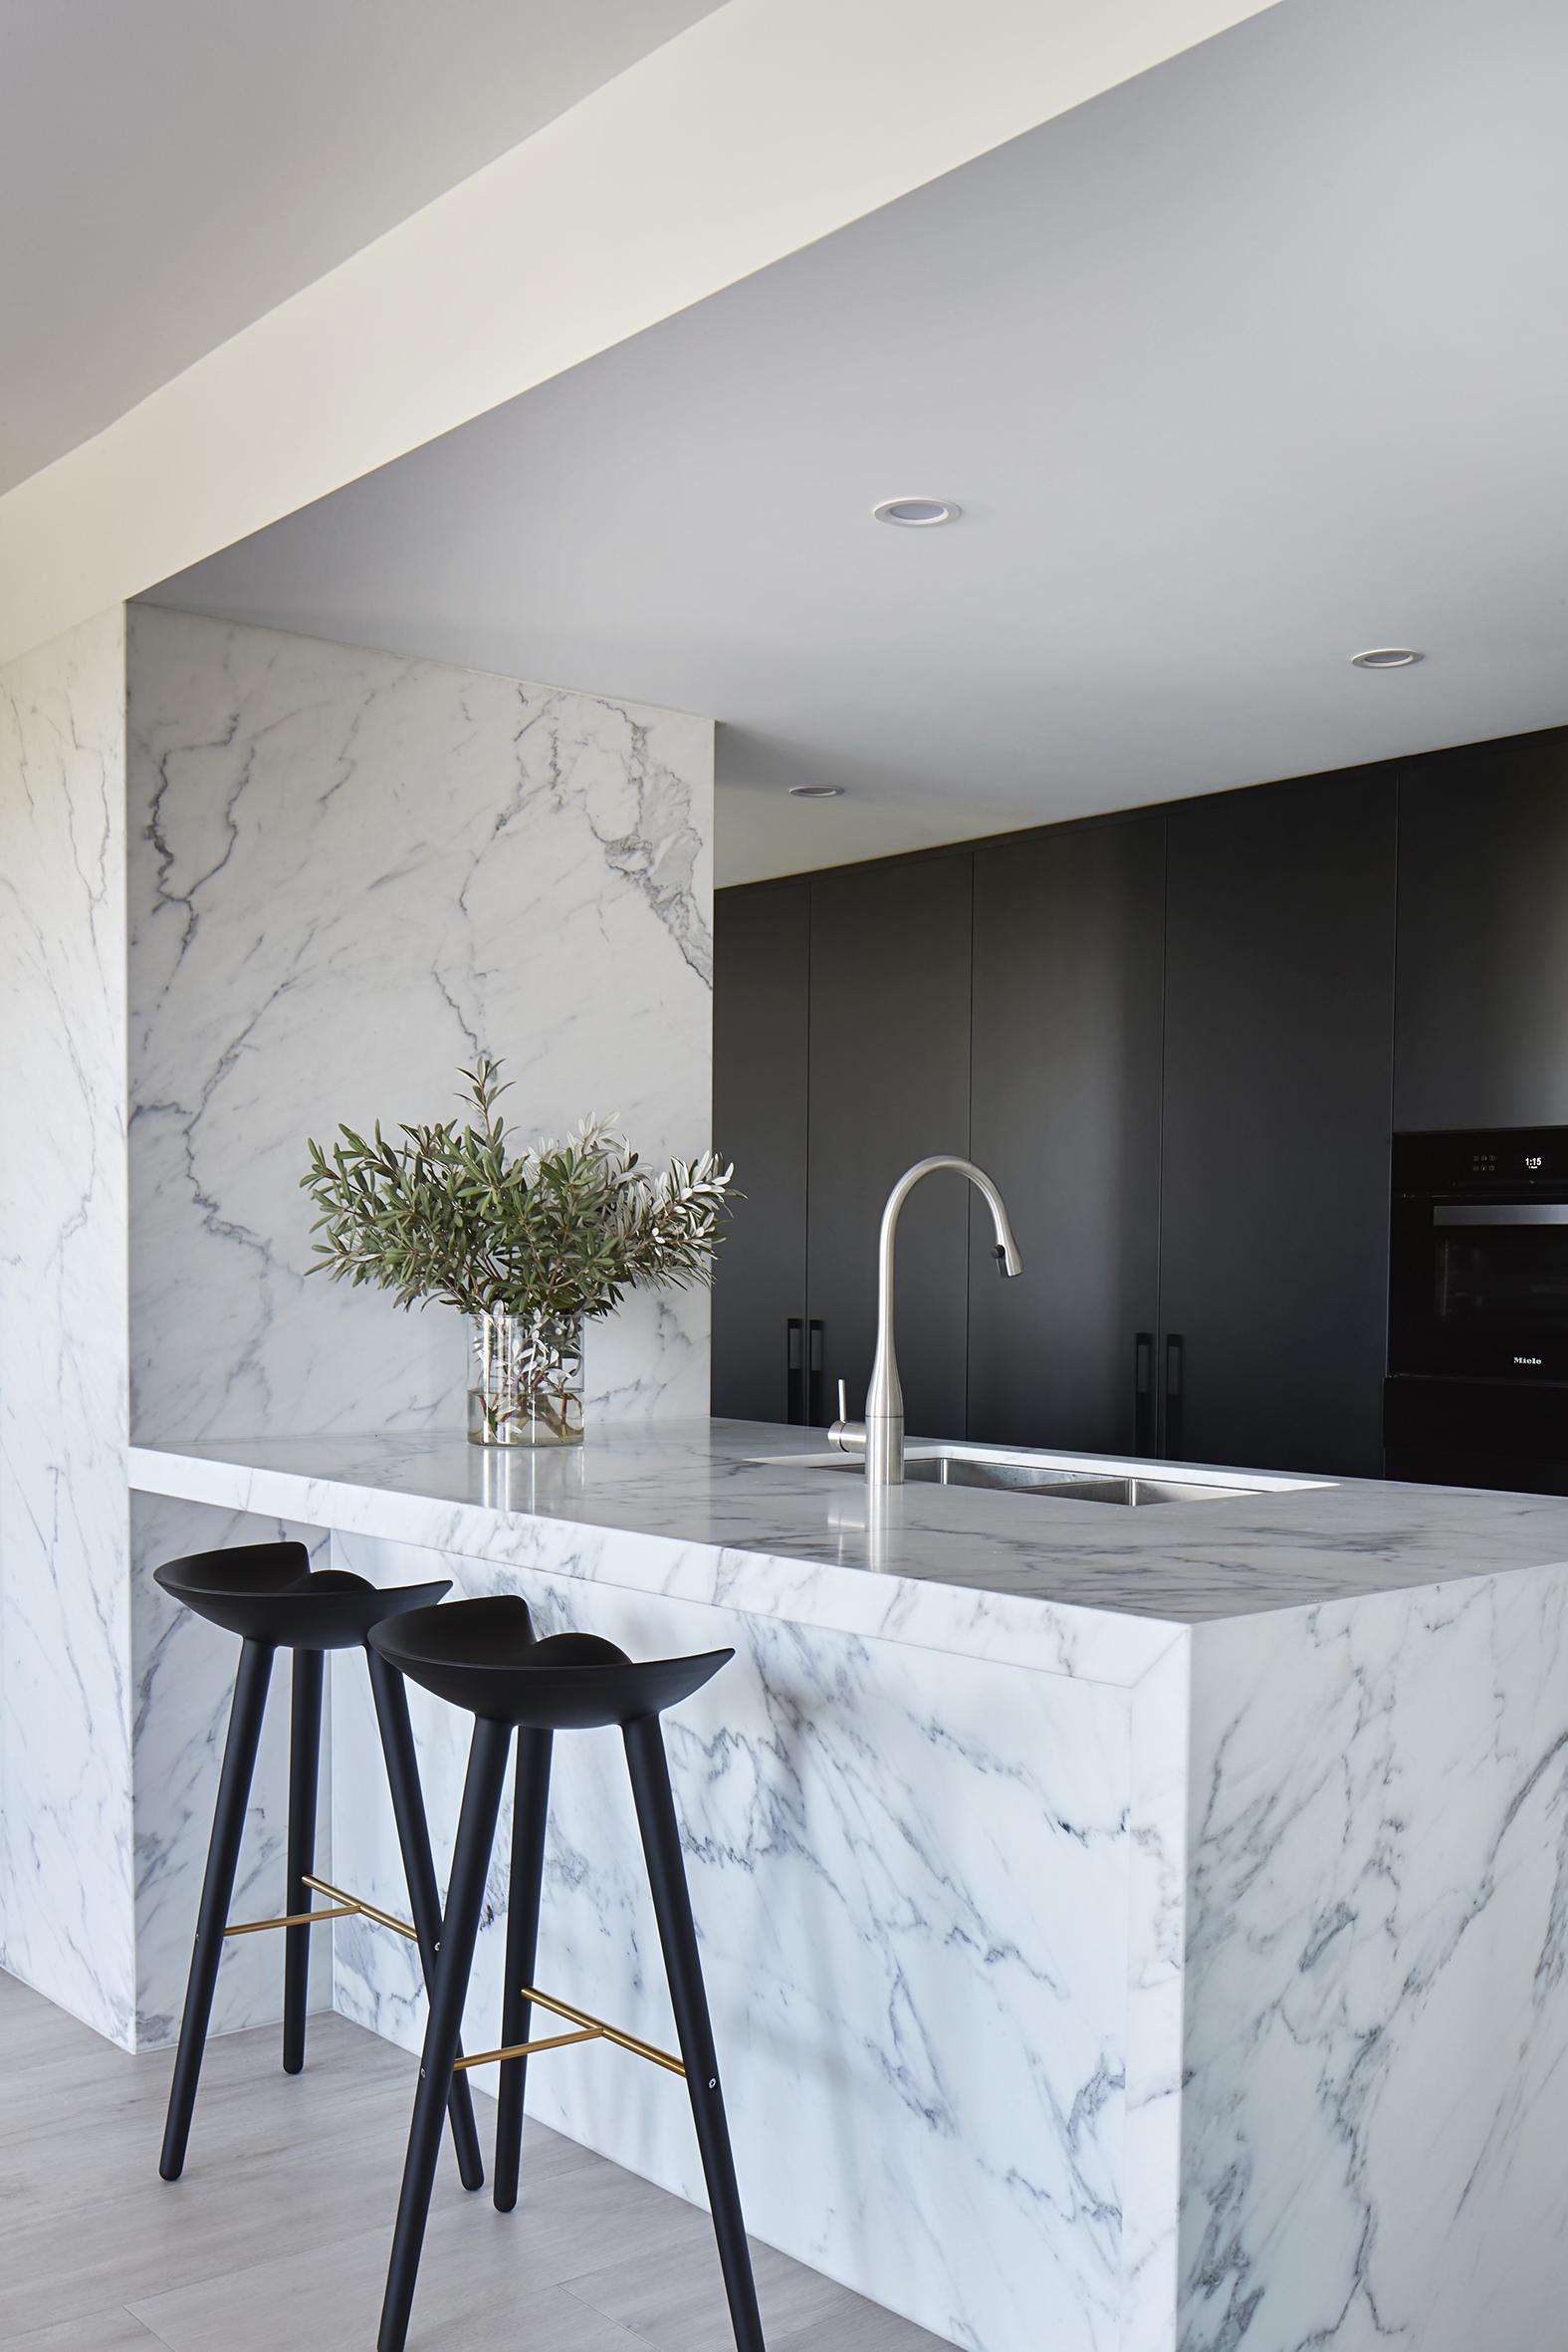 Gallery Of Compartment Apartment Local Australian Architecture & Design Richmond, Melbourne Image 3